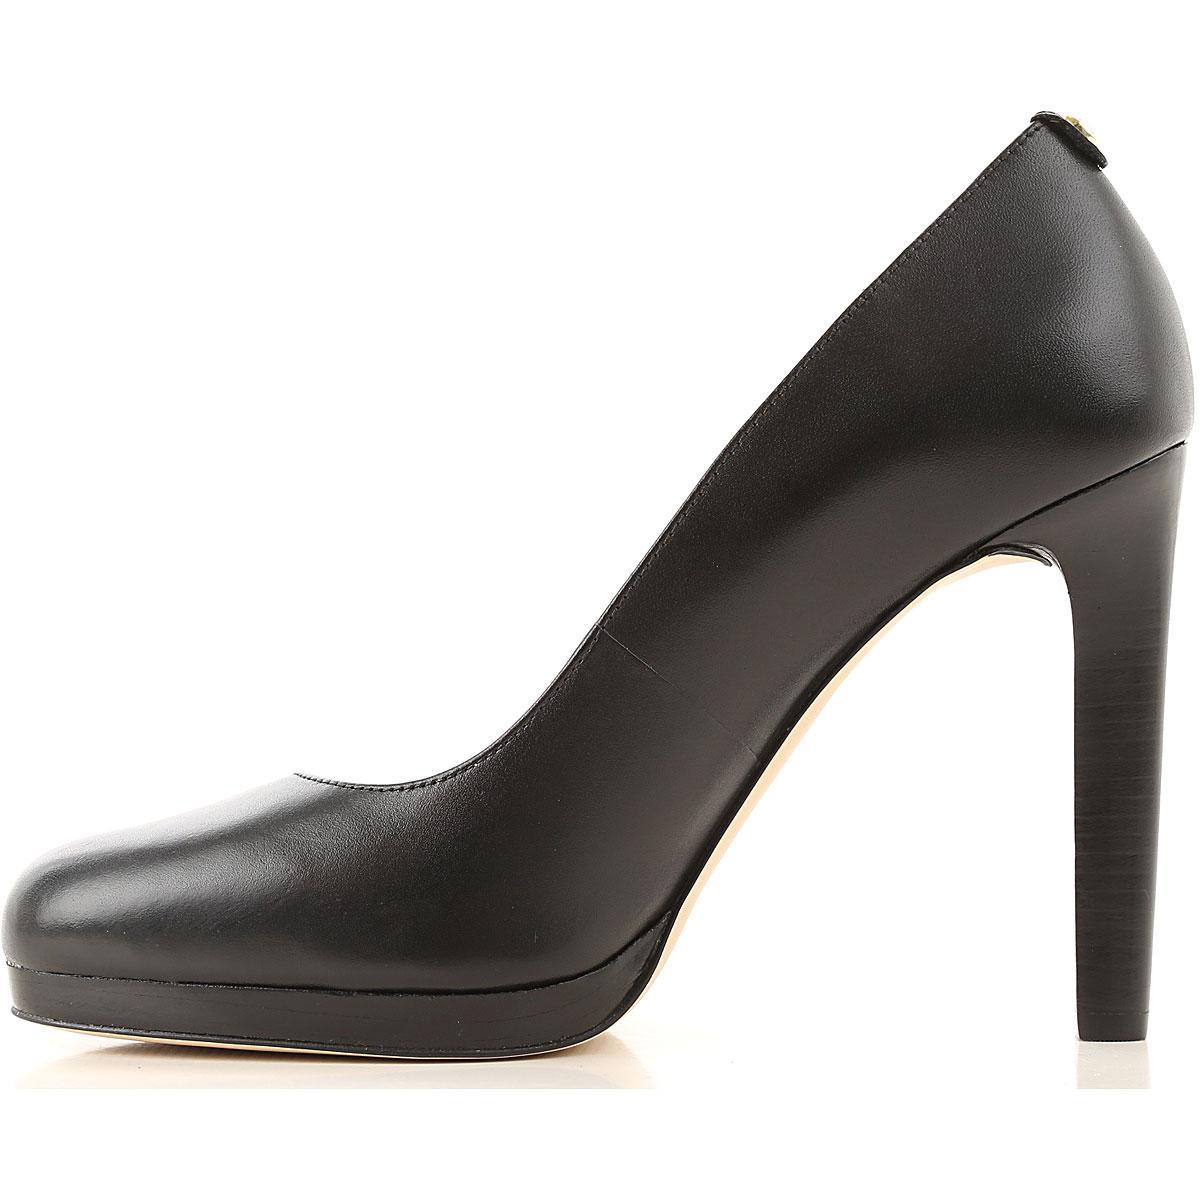 Zapatos de Tacón de Salón Baratos en Rebajas Outlet Michael Kors de color Negro